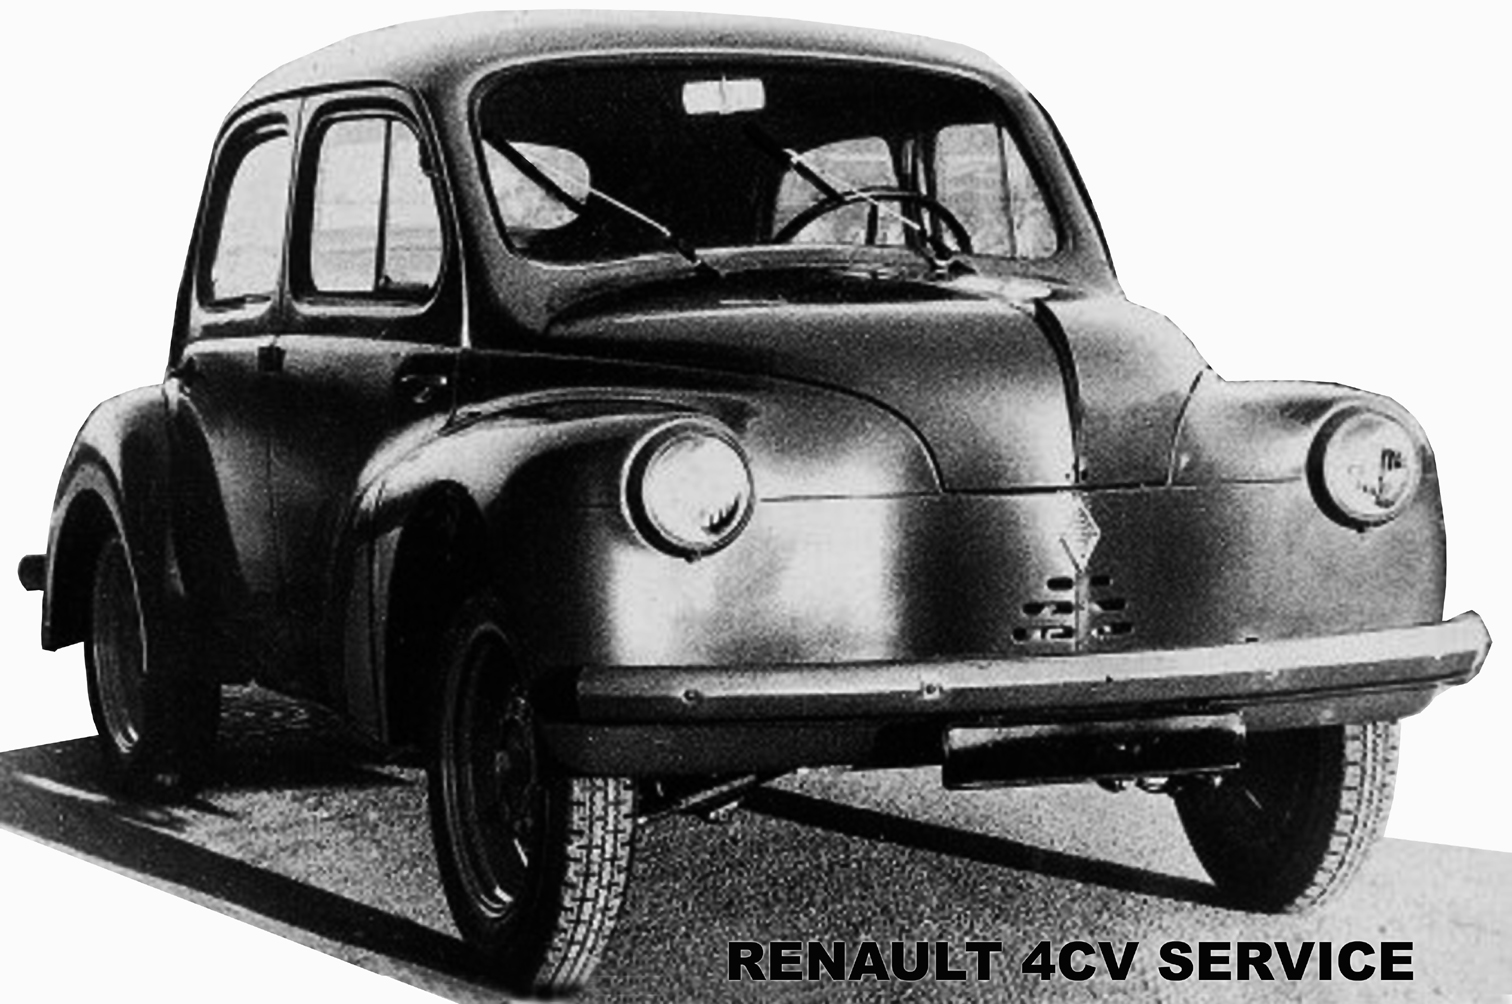 renault 4cv service